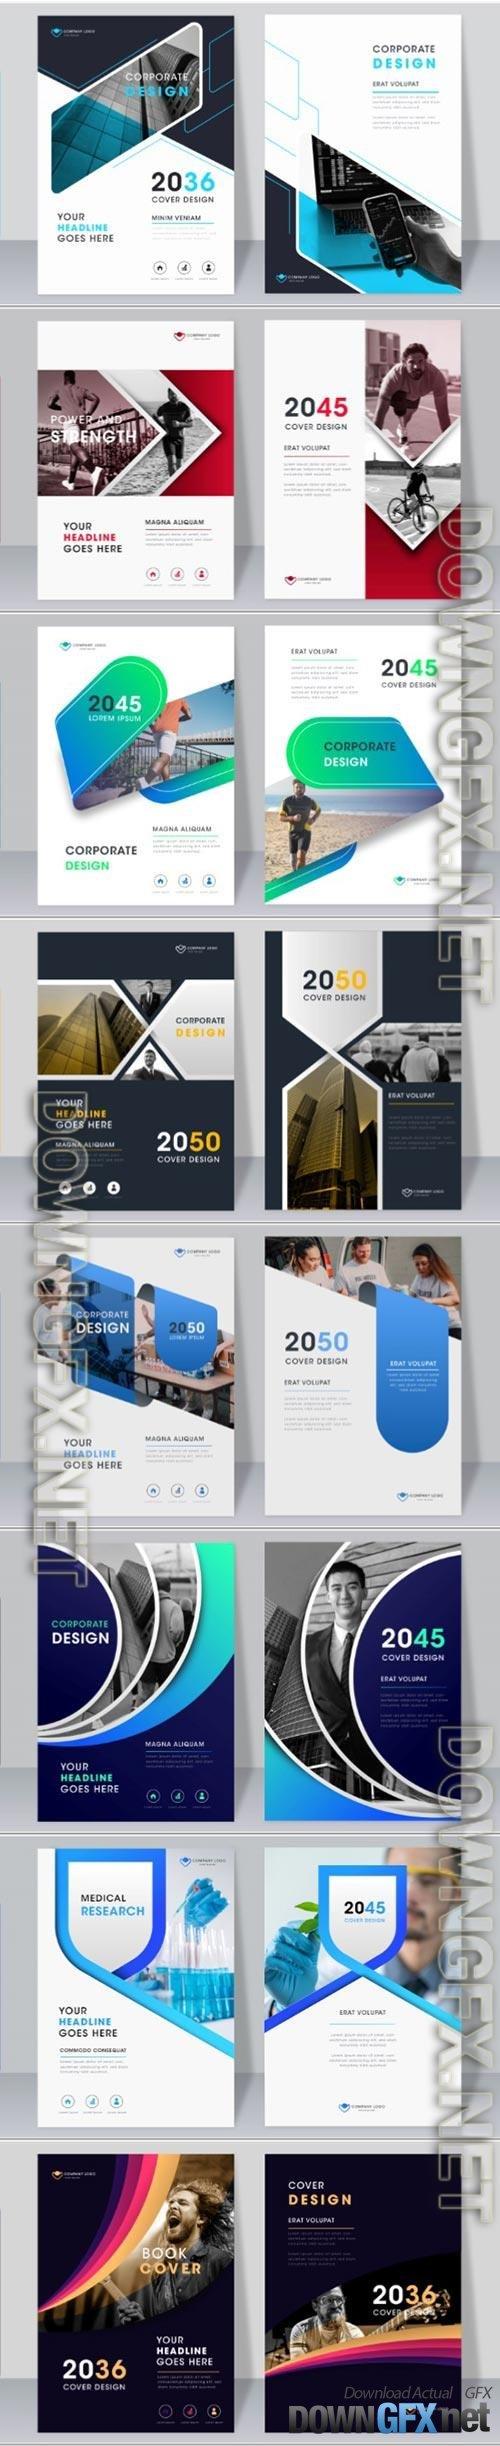 Multipurpose corporate modern book cover vector template